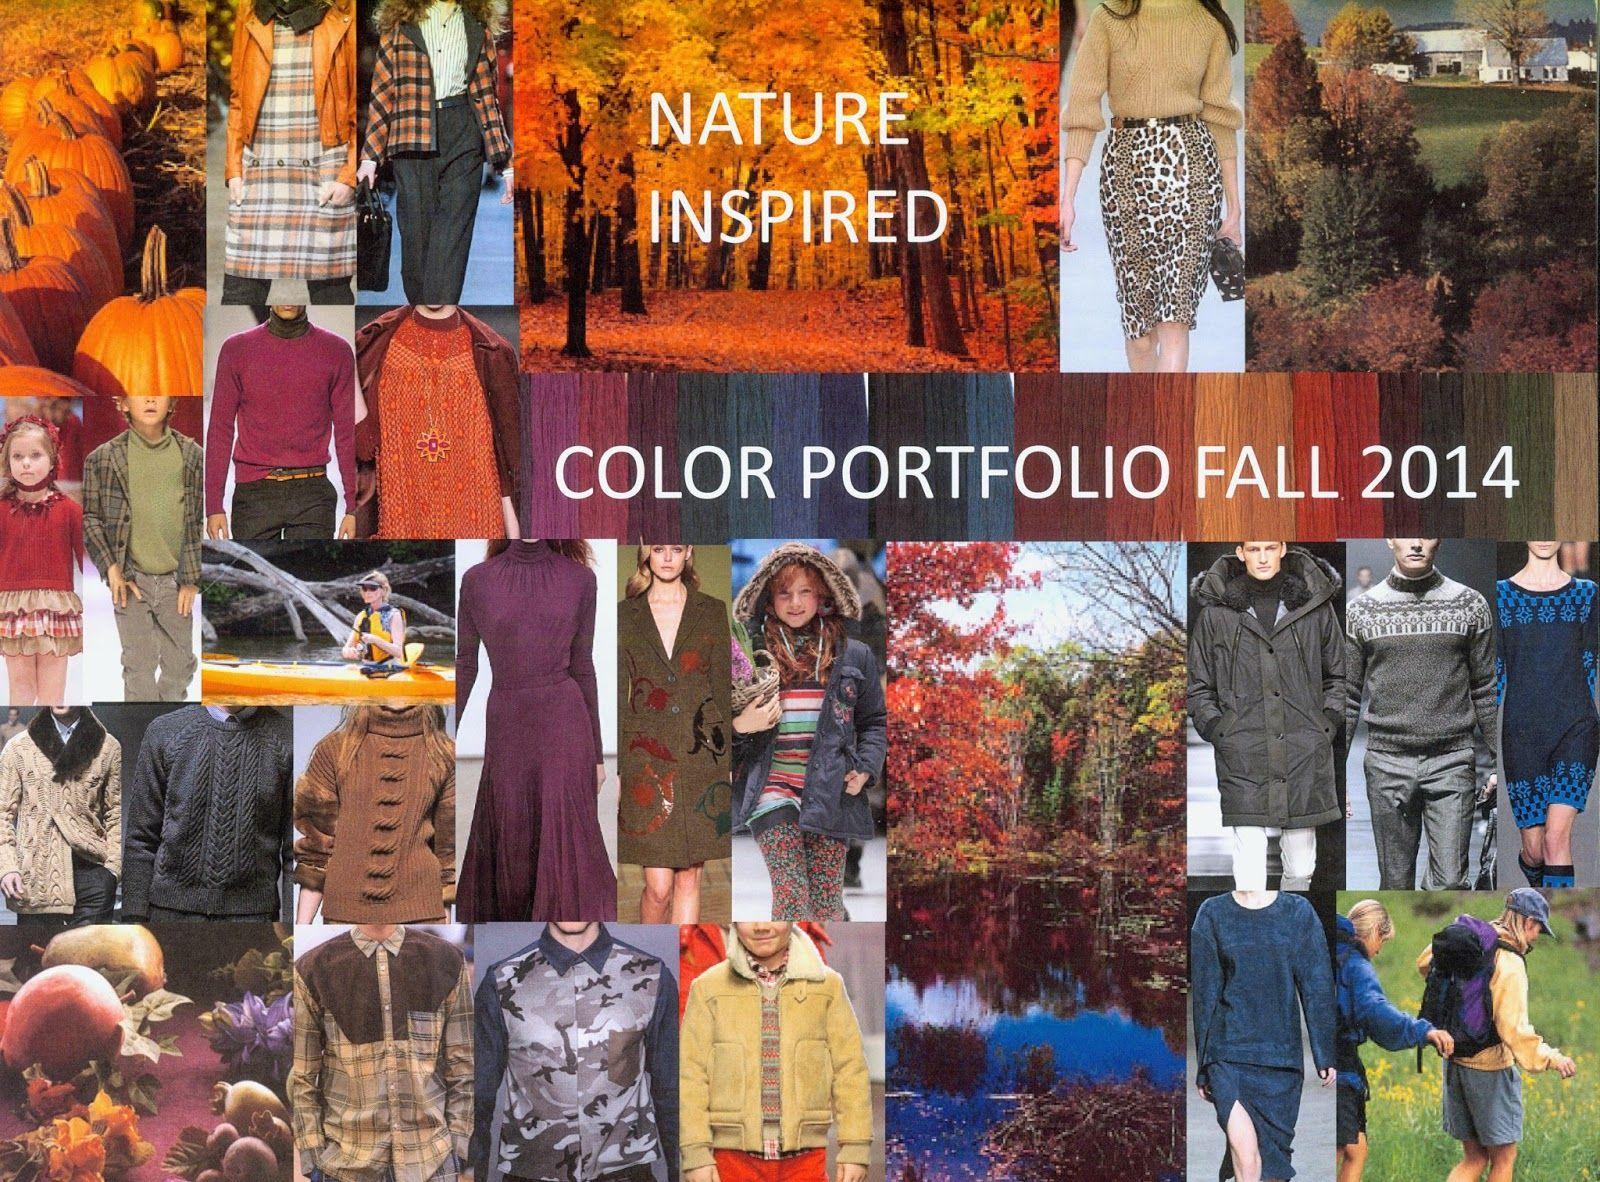 OPR (Overseas Publishers Representatives): Color Portfolio Autumn/Winter 2014-15 Color Forecast